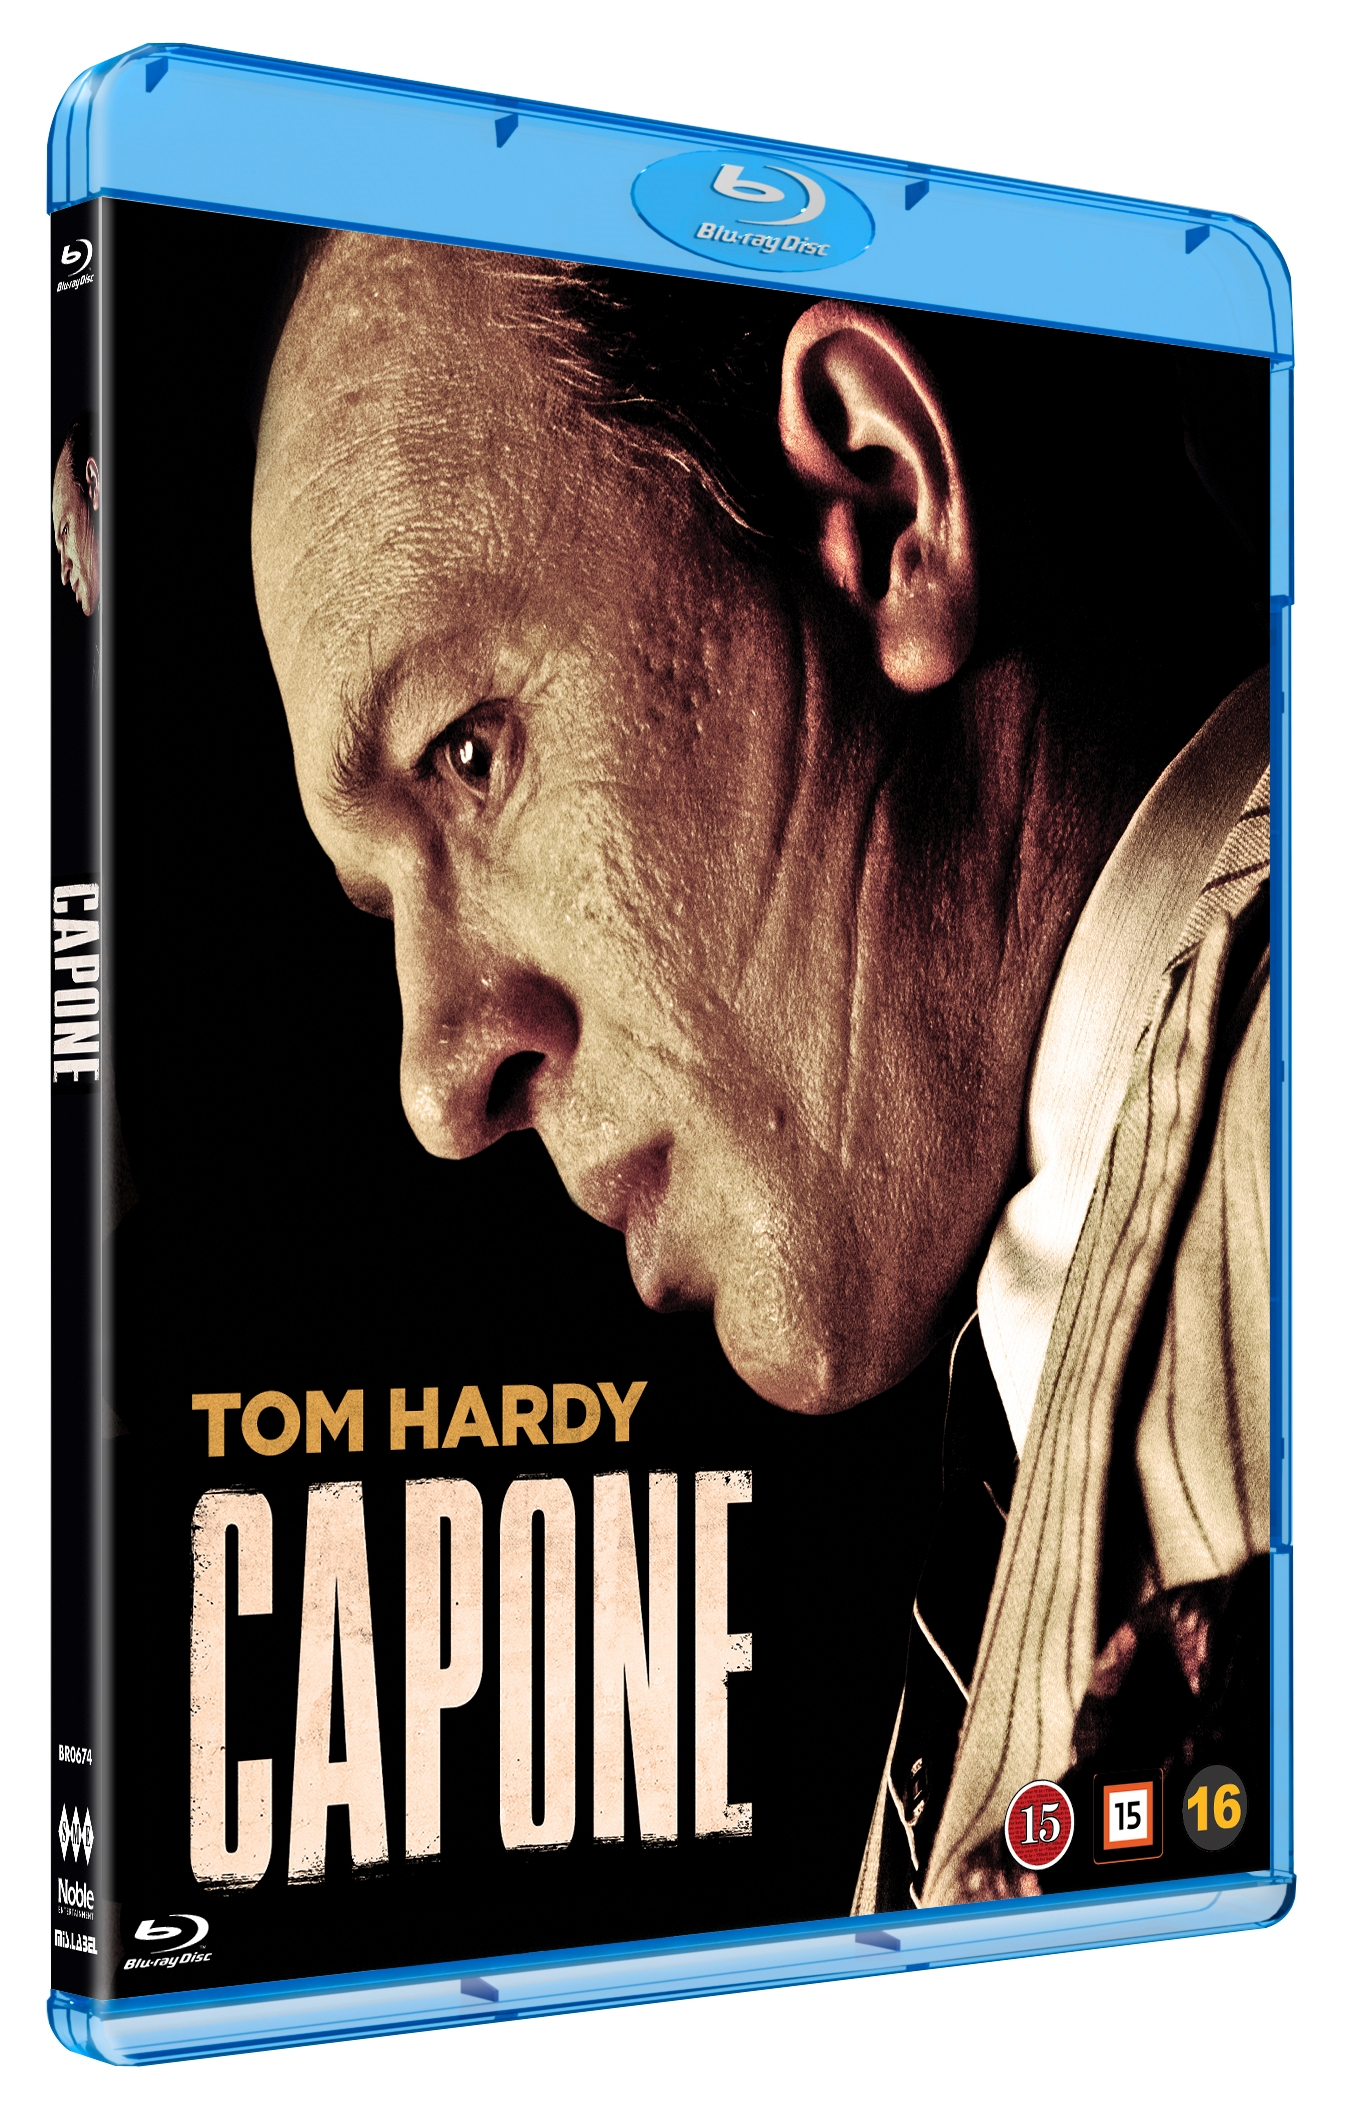 Capone -  - Film -  - 5705535065429 - July 9, 2020